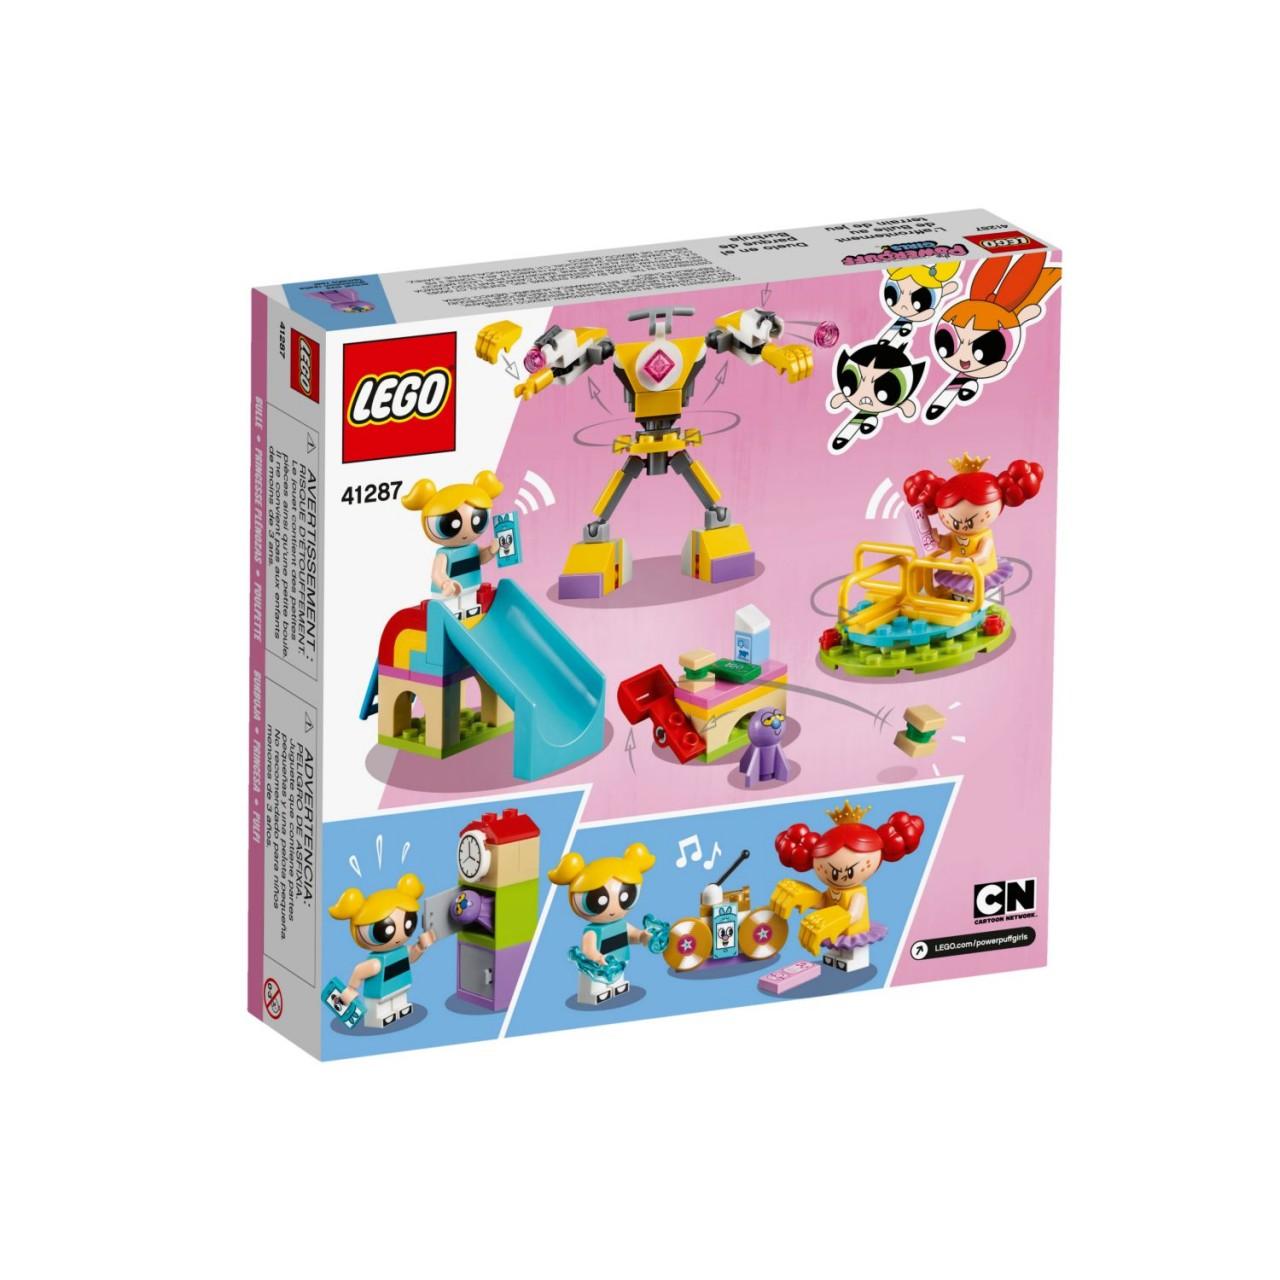 LEGO THE POWERPUFF GIRLS 41287 Bubbles' Spielplatzabenteuer